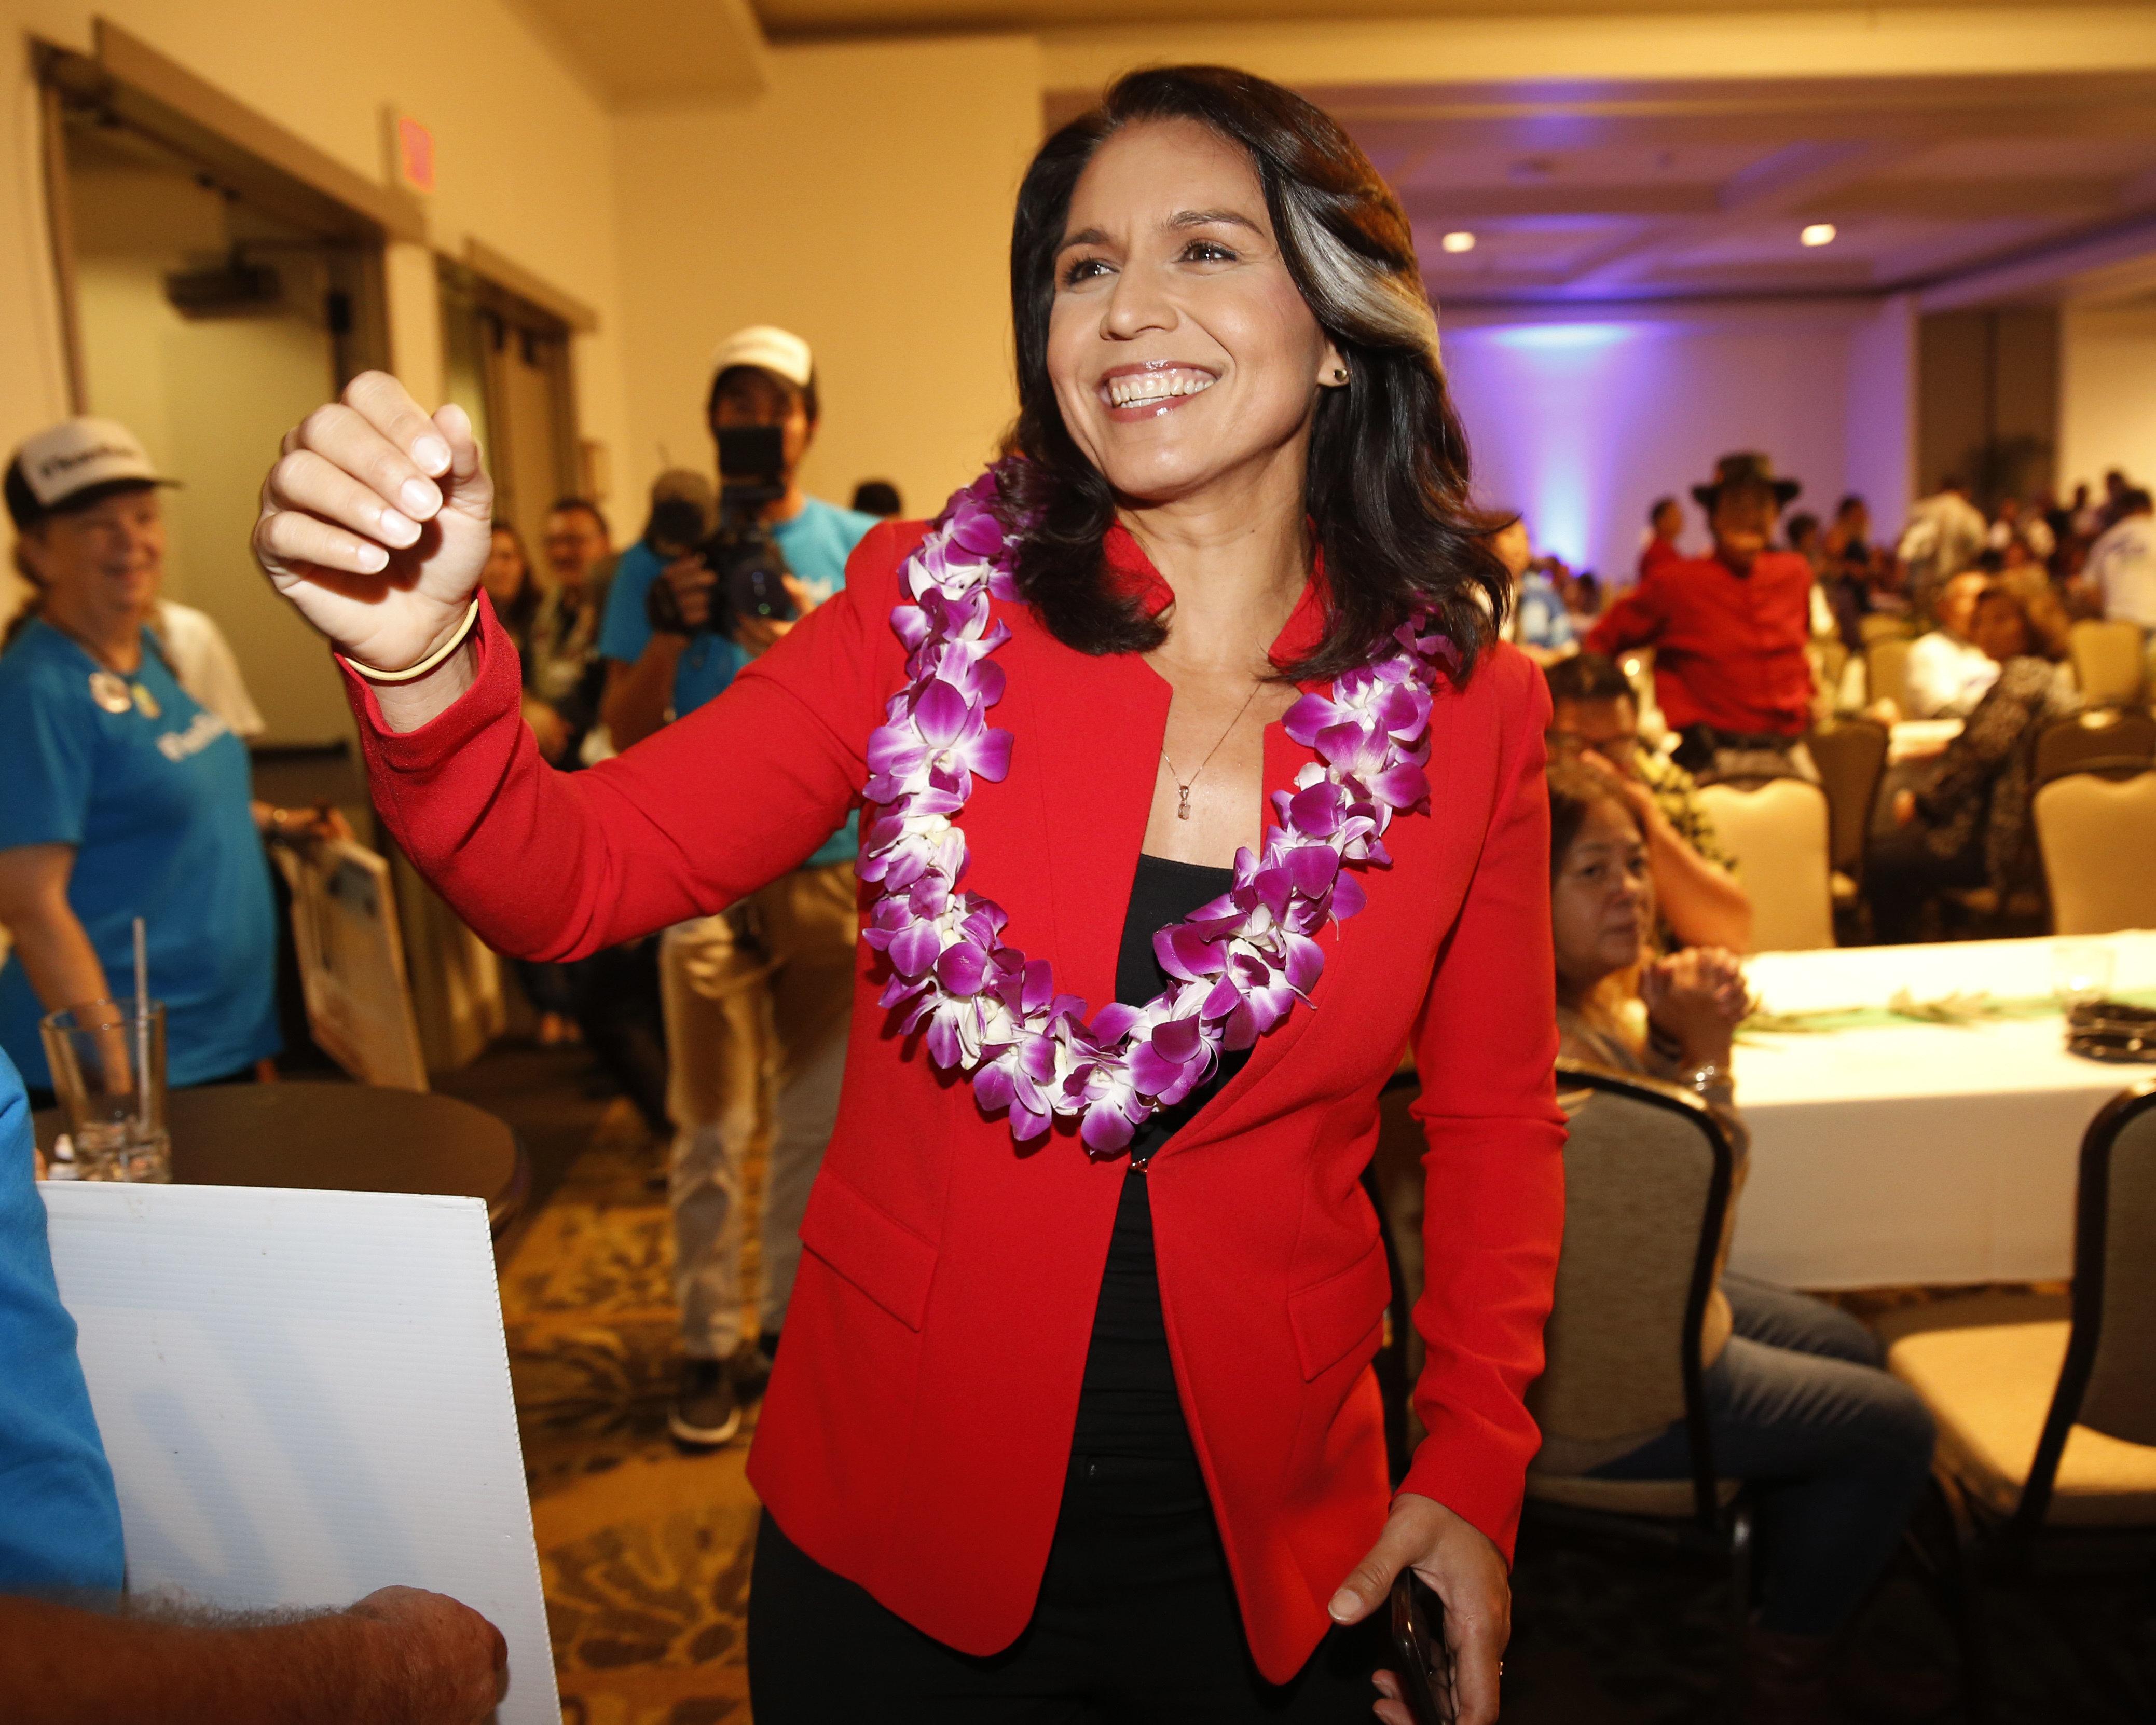 Rep. Tulsi Gabbard, D-Hawaii, greets supporters Tuesday, Nov. 6, 2018, in Honolulu. (AP Photo/Marco Garcia)